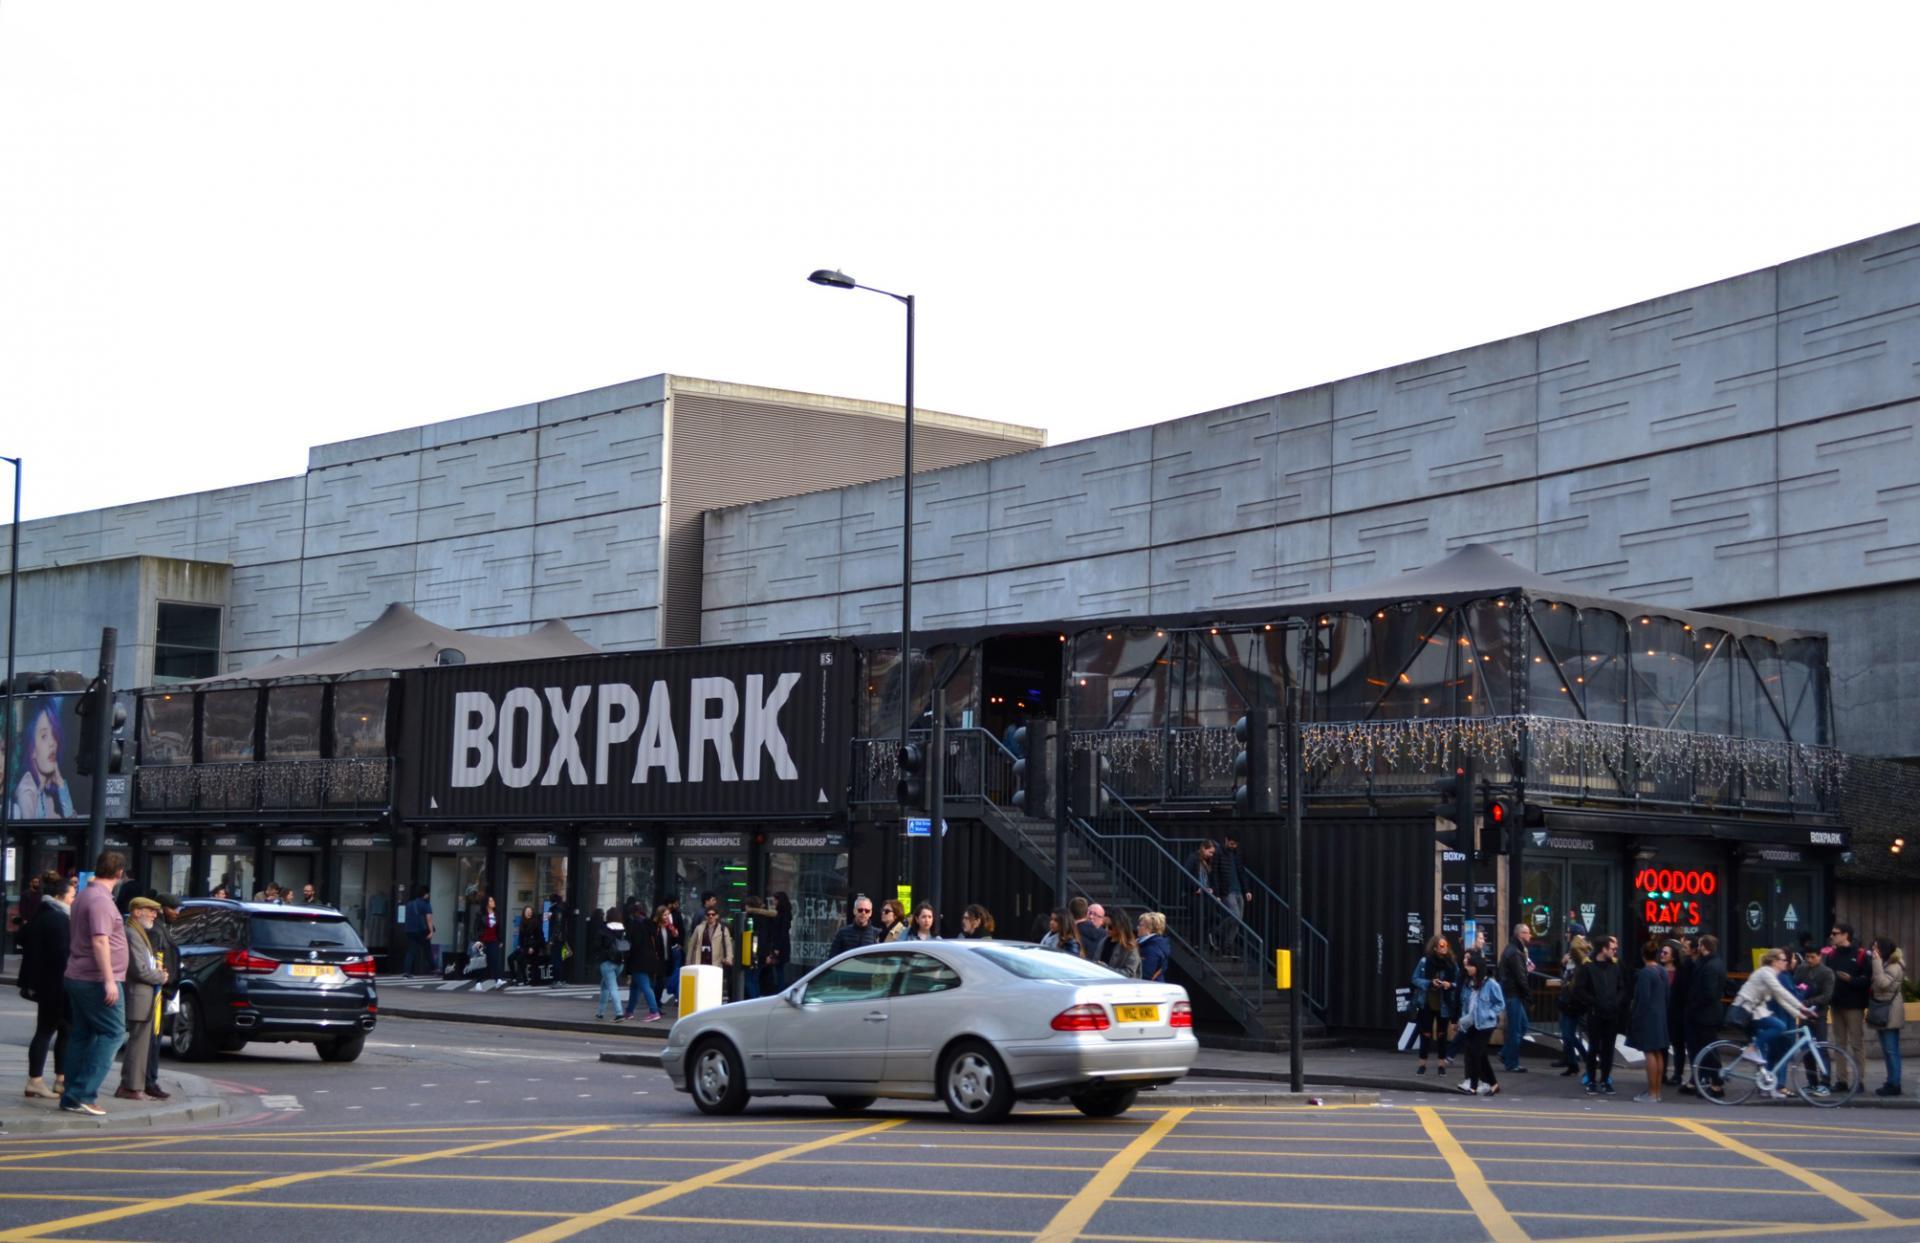 Tiendas en Londres: Boxpark